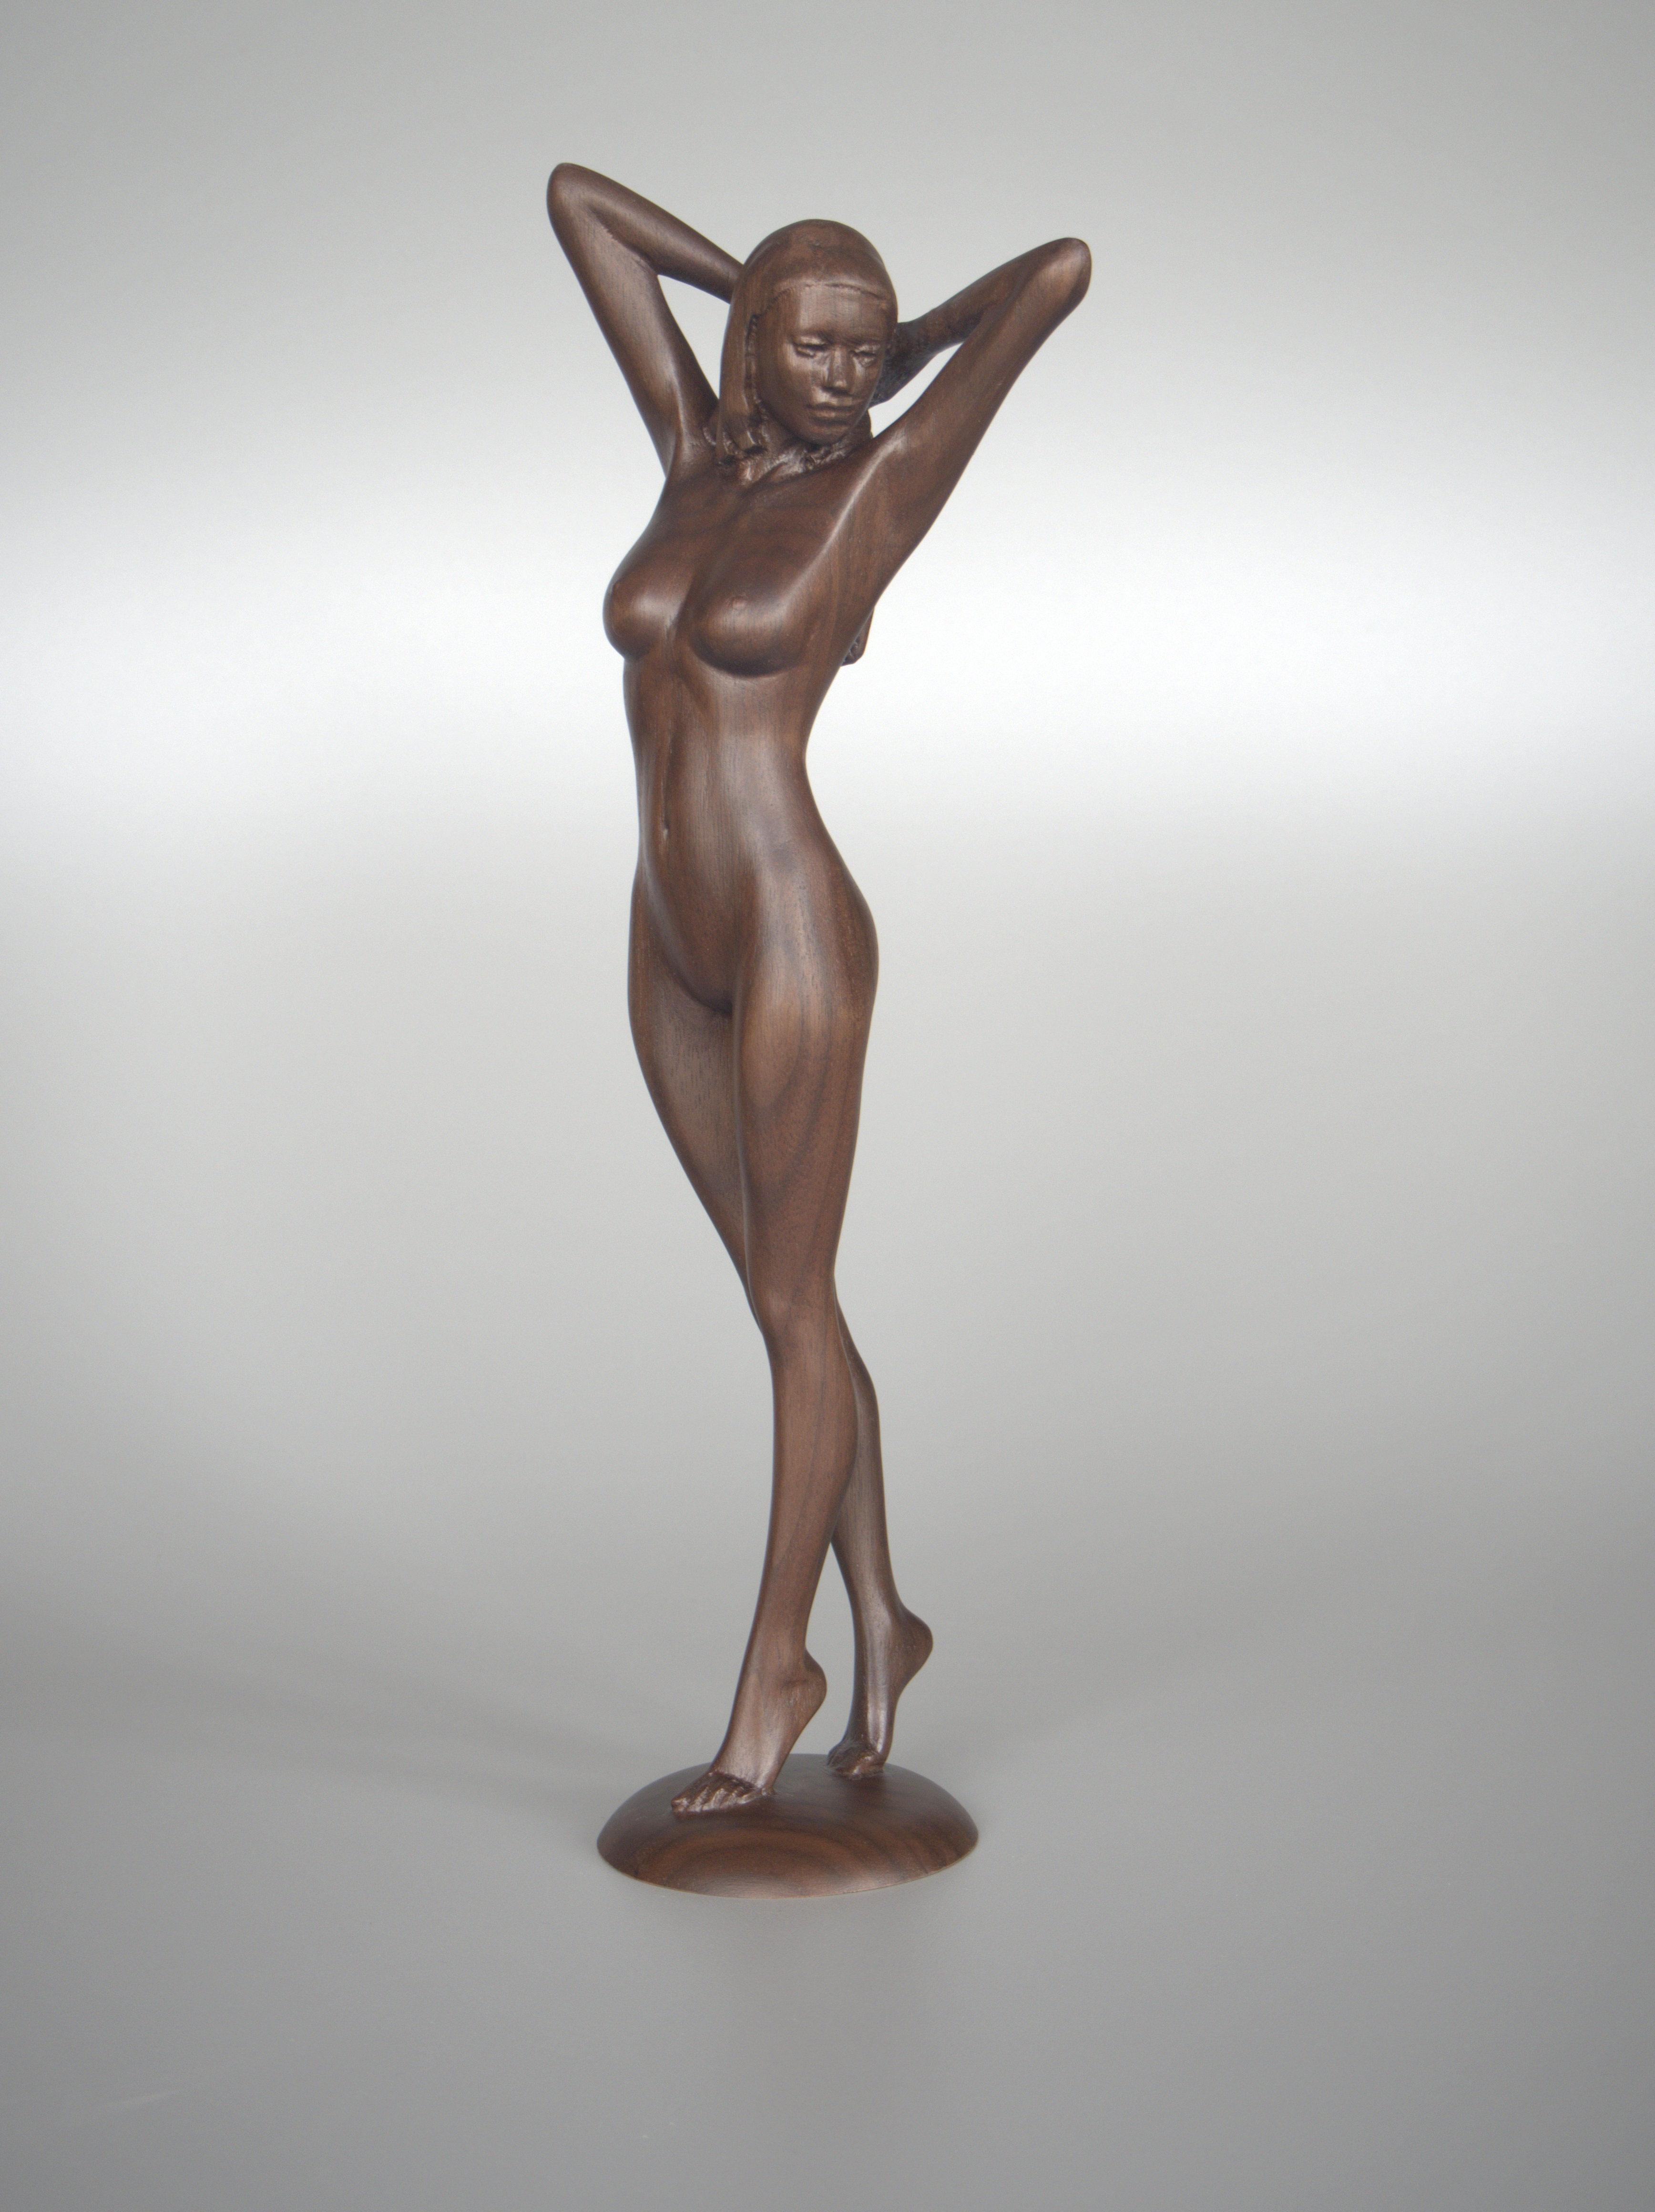 3D-Skulptur